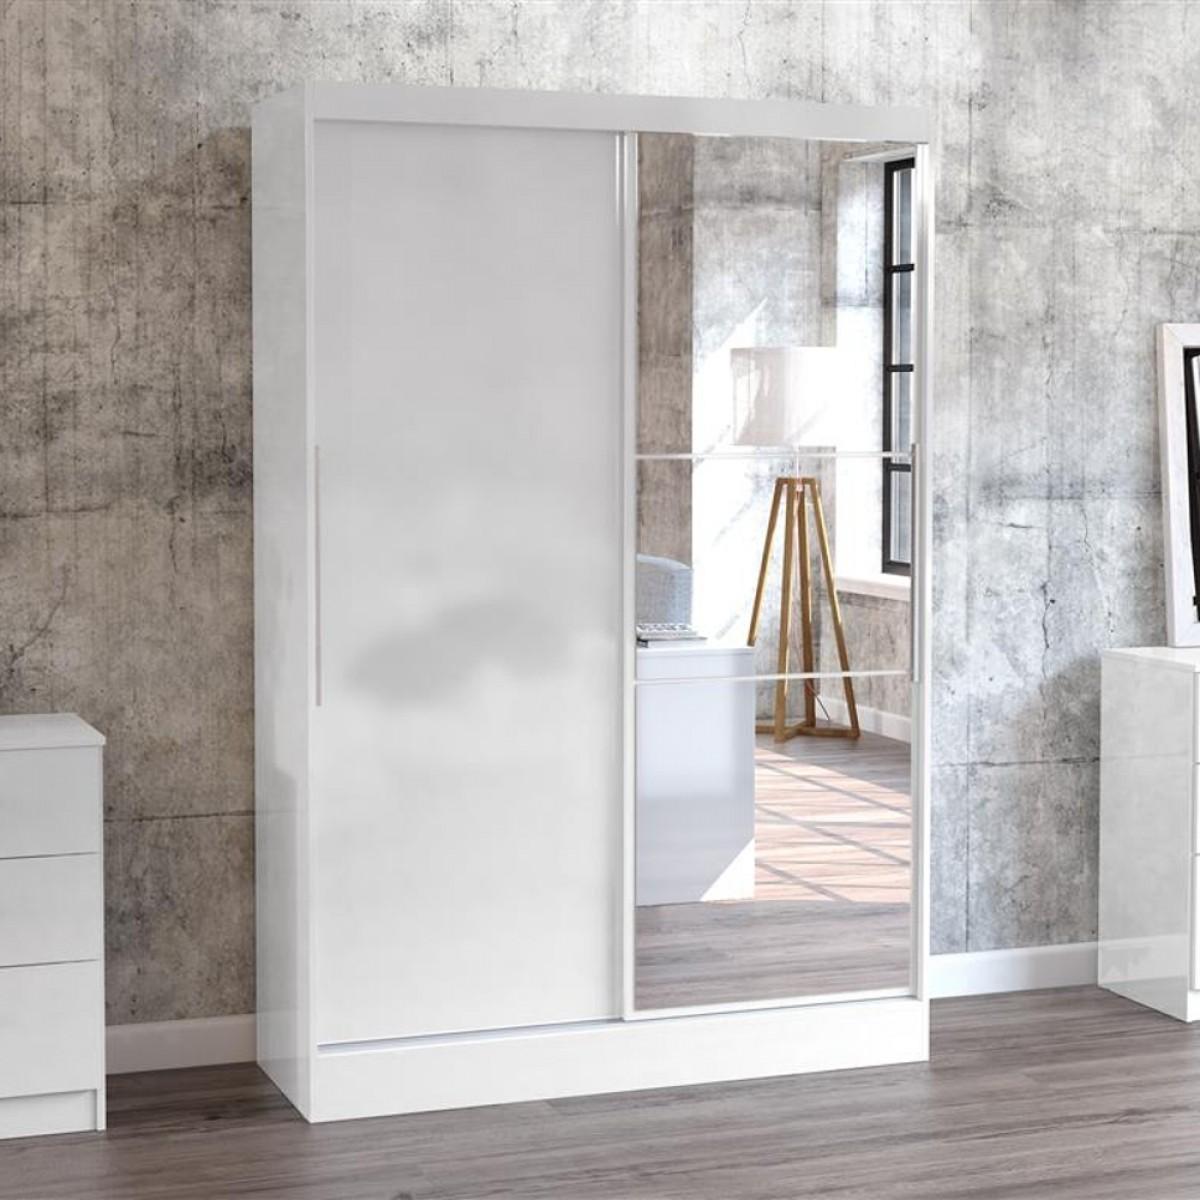 Lynx 2 door sliding mirrored wardrobe white